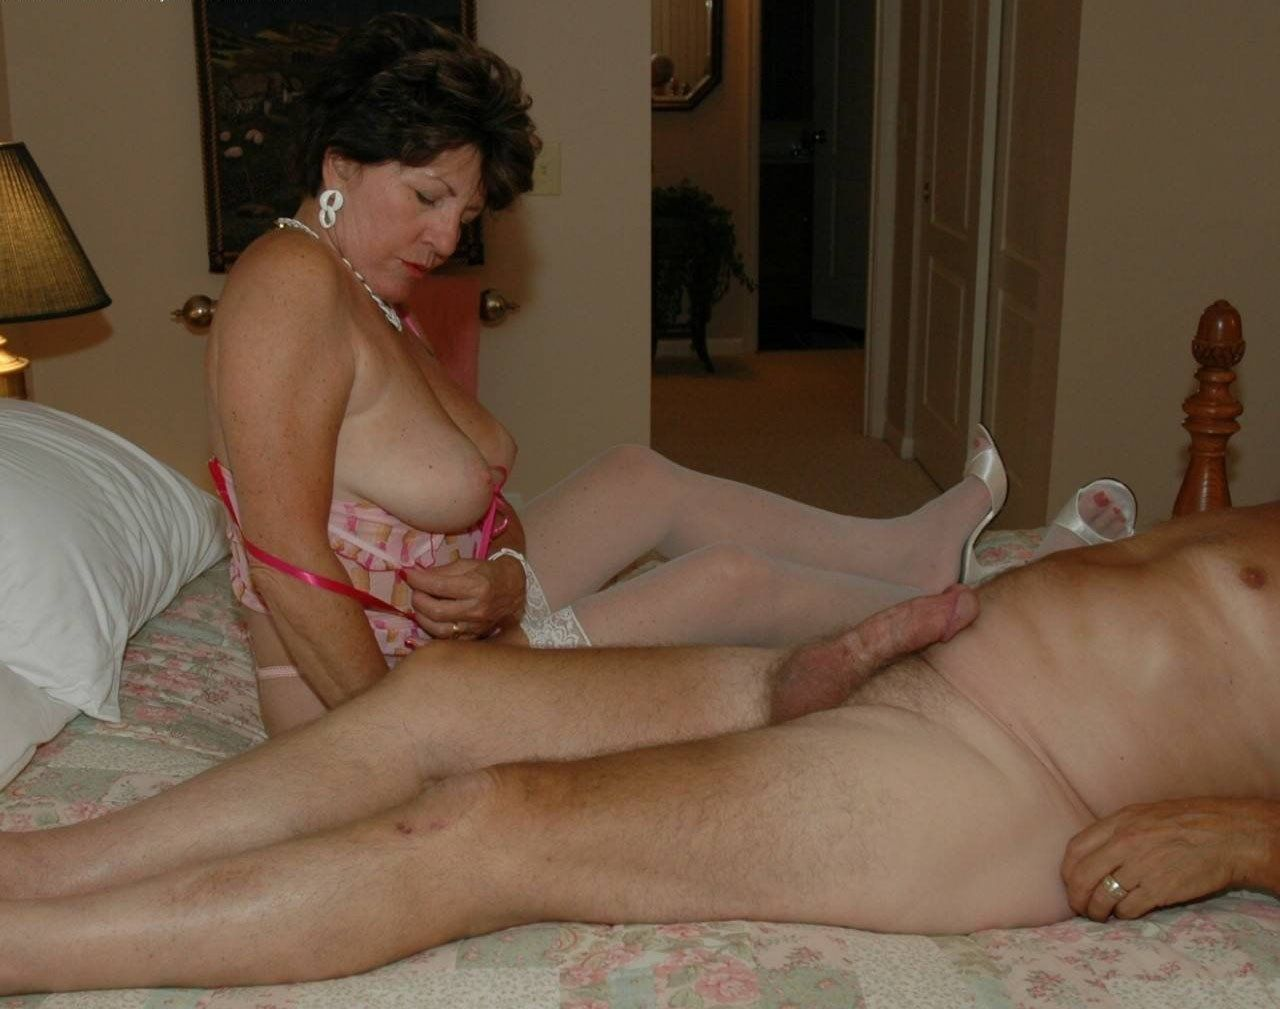 Amateur mature nude gothique filles avec @todorazor.com